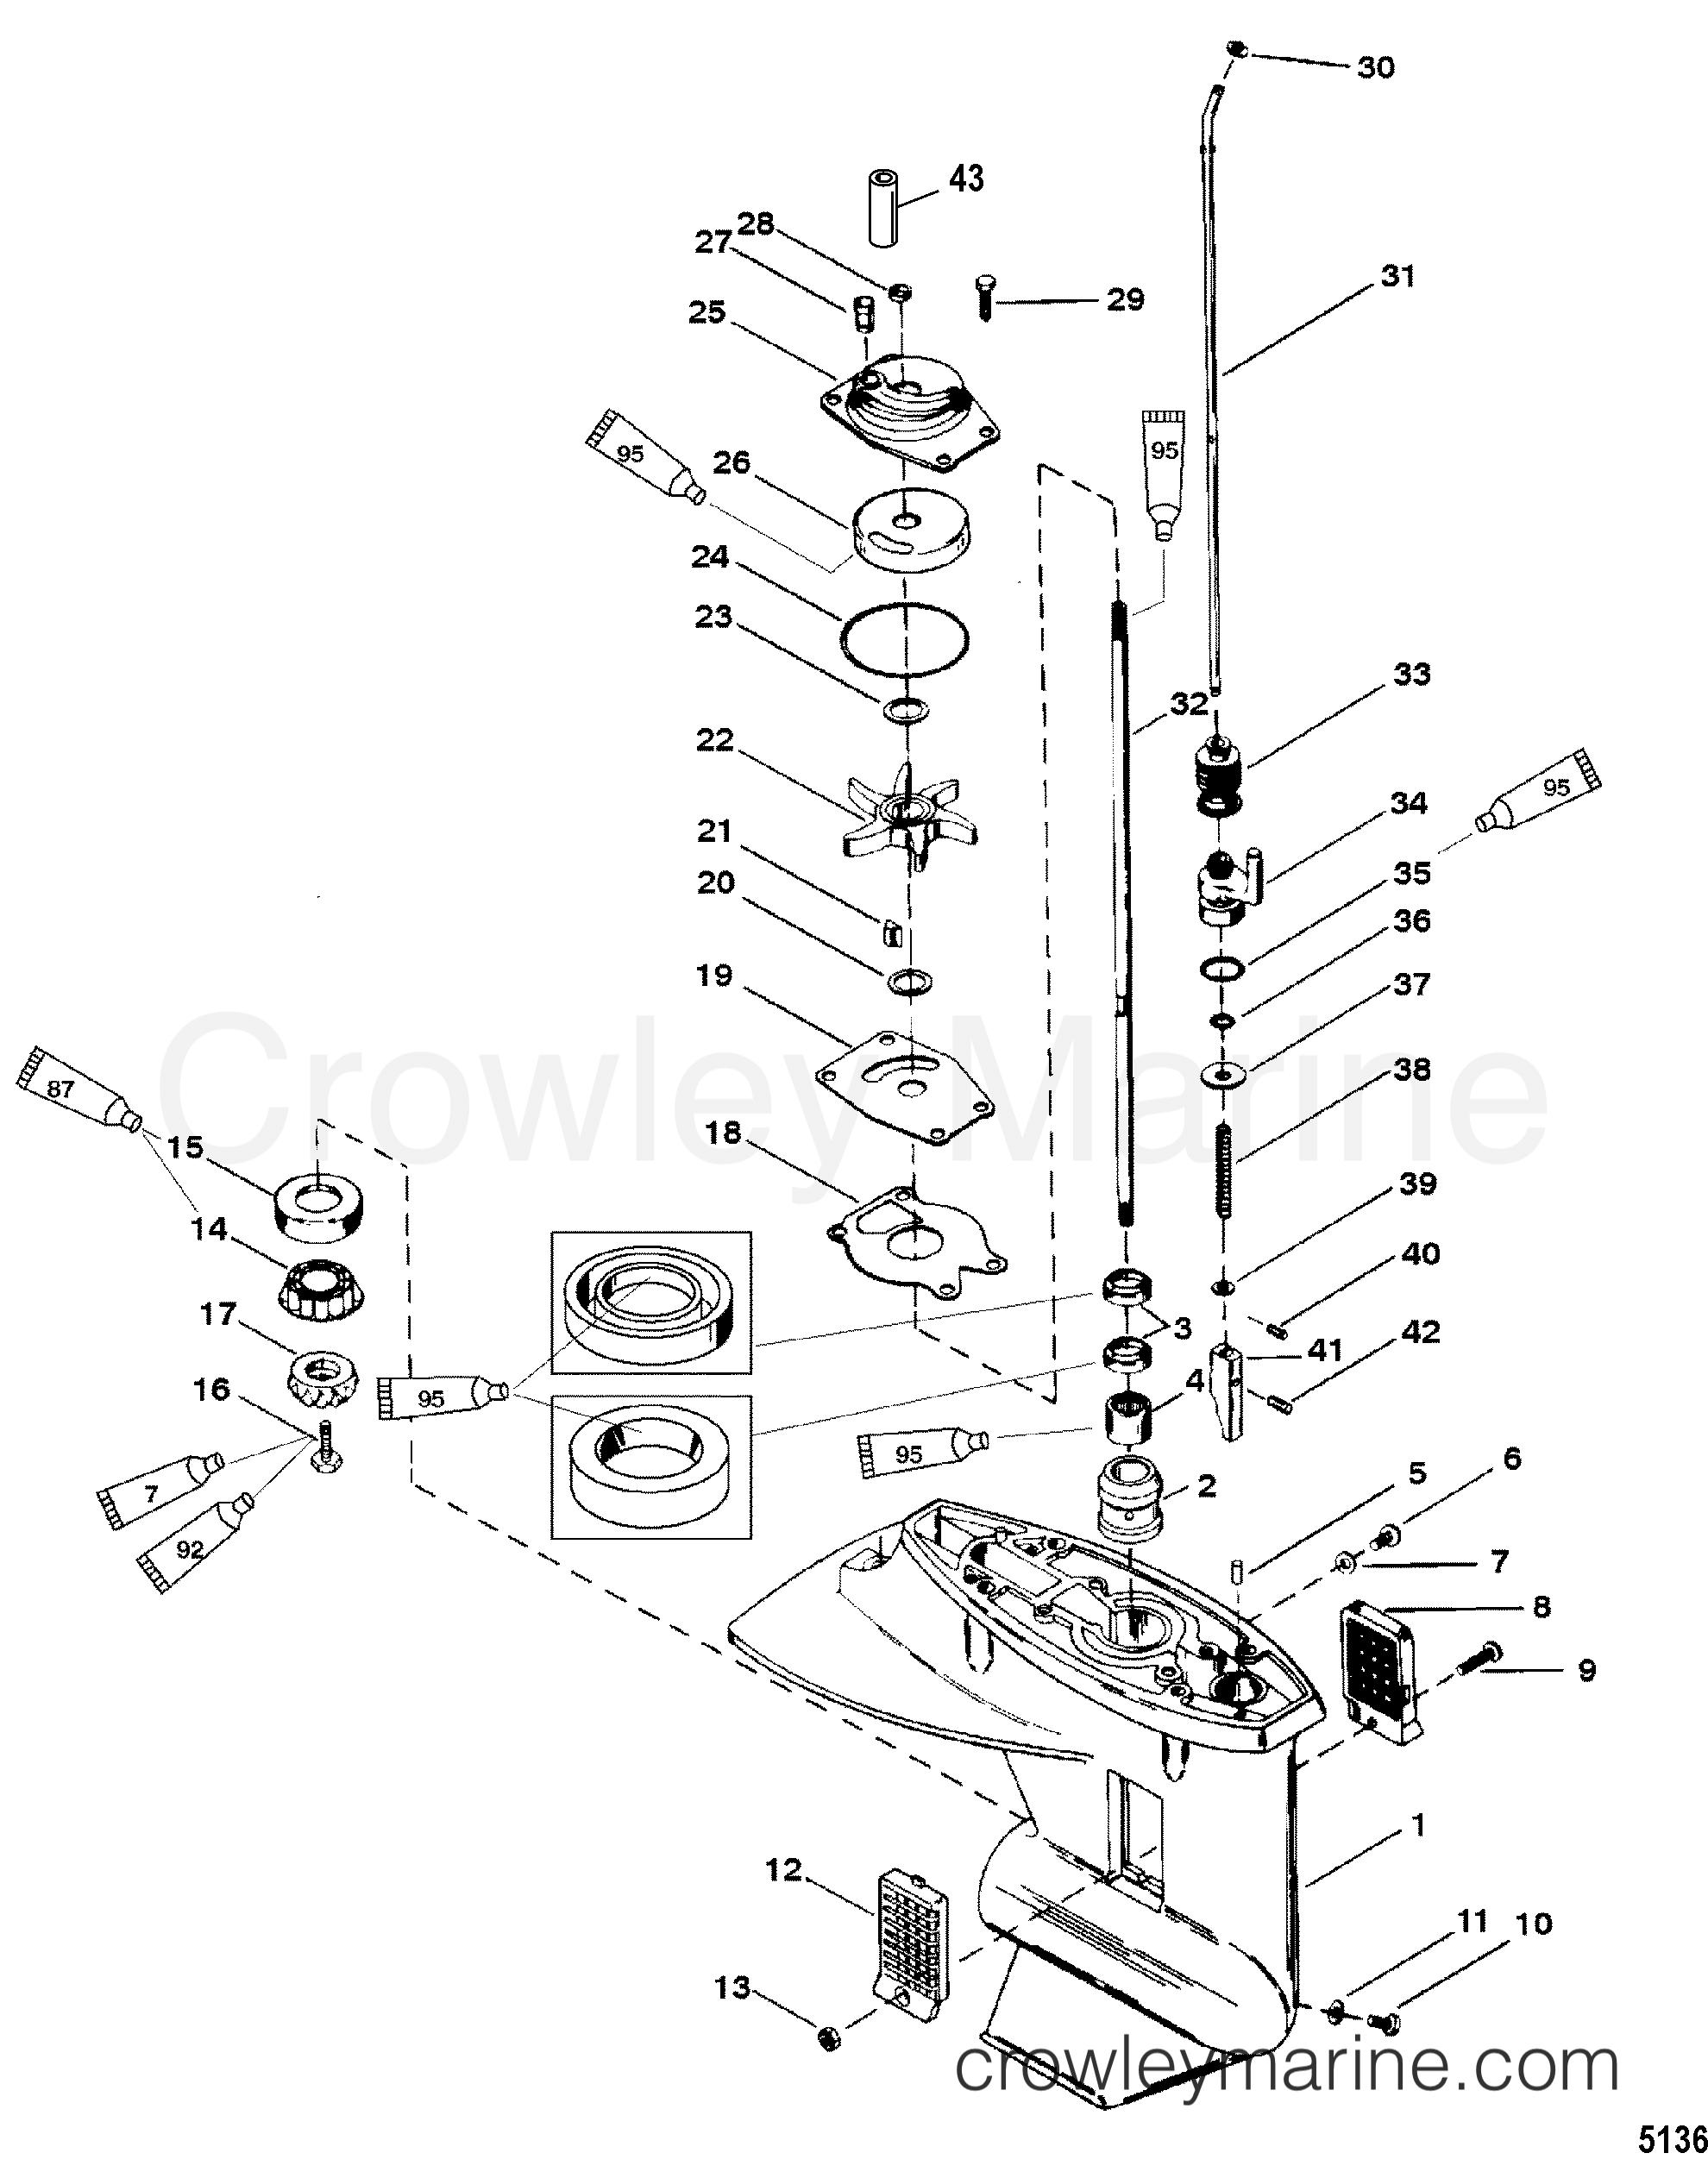 2000 Mercury Outboard 25 [M] - 1025202WD - GEAR HOUSING(DRIVESHAFT) (2.25:1 GEAR RATIO) section